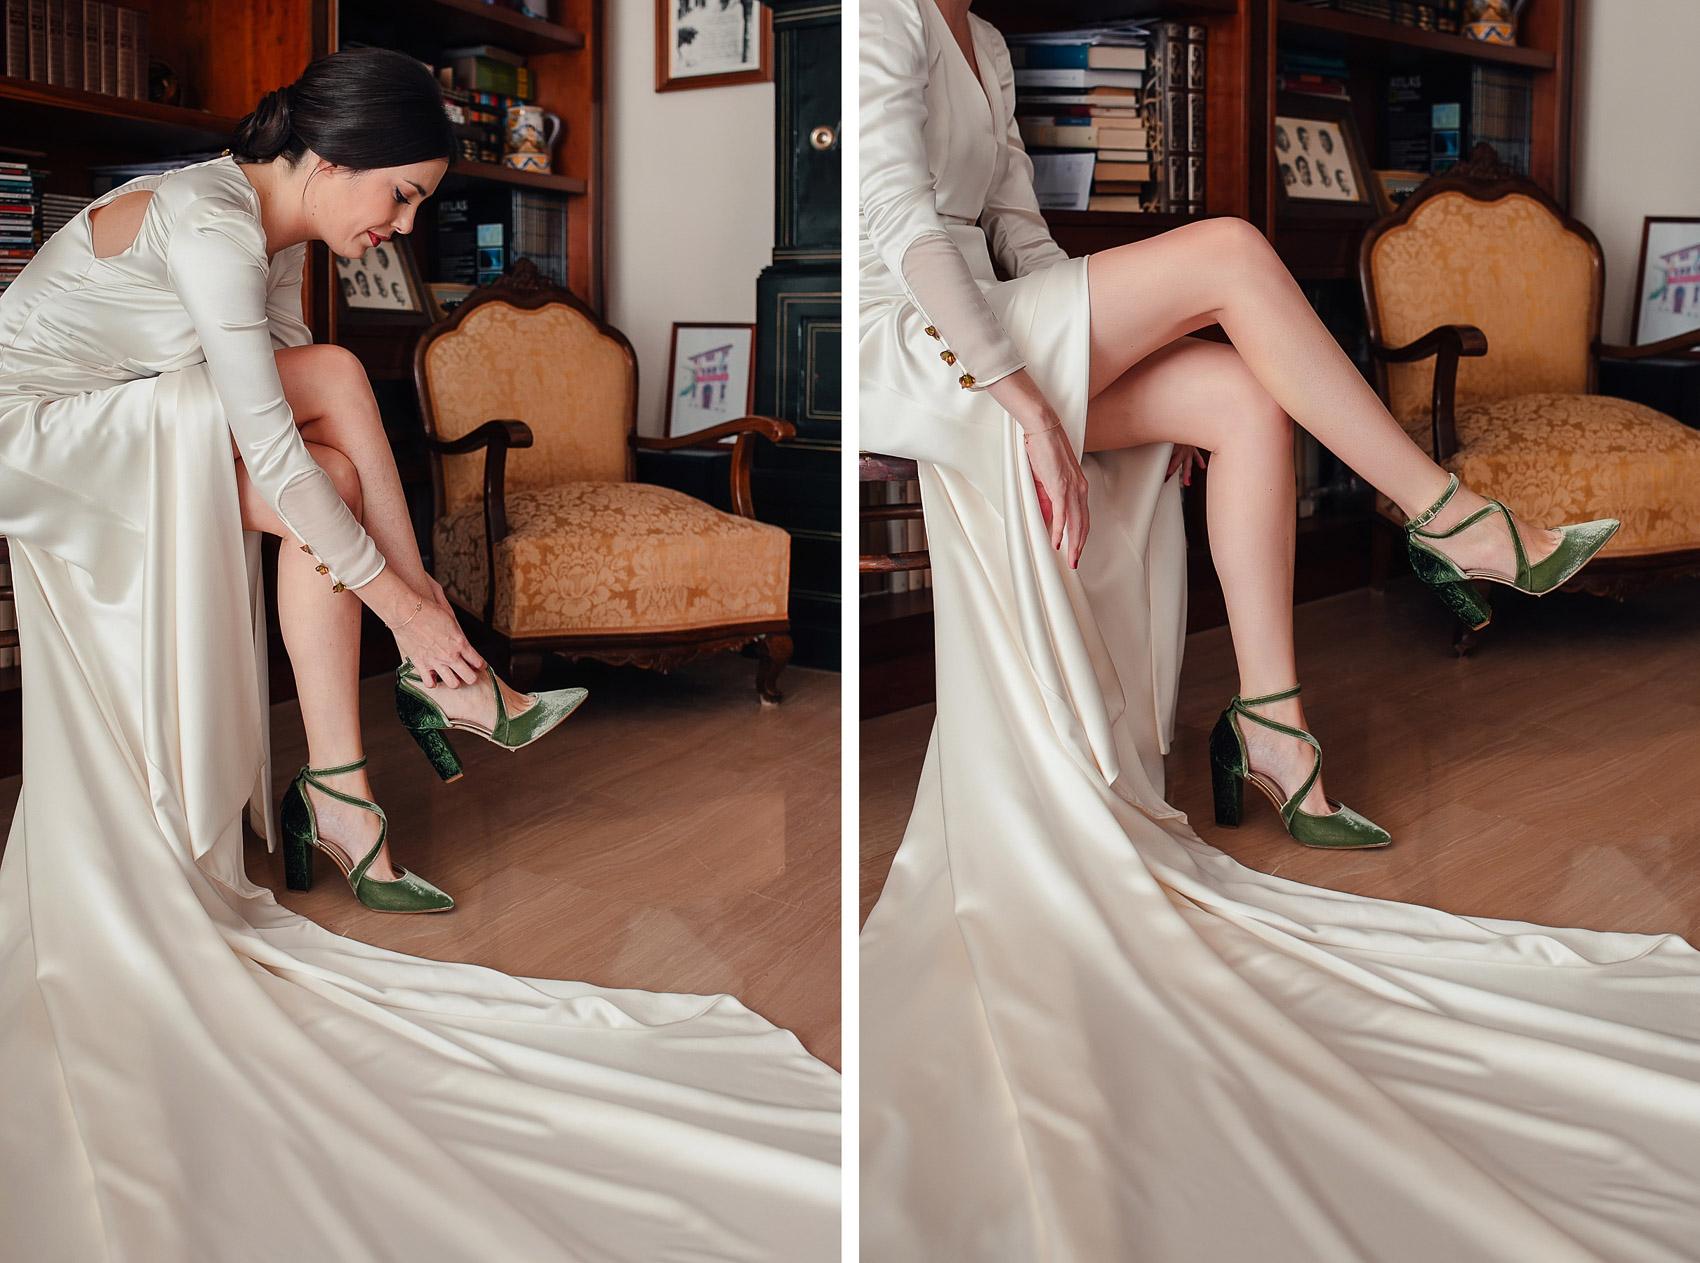 Zapatos just ene Marcela Mansergas novia